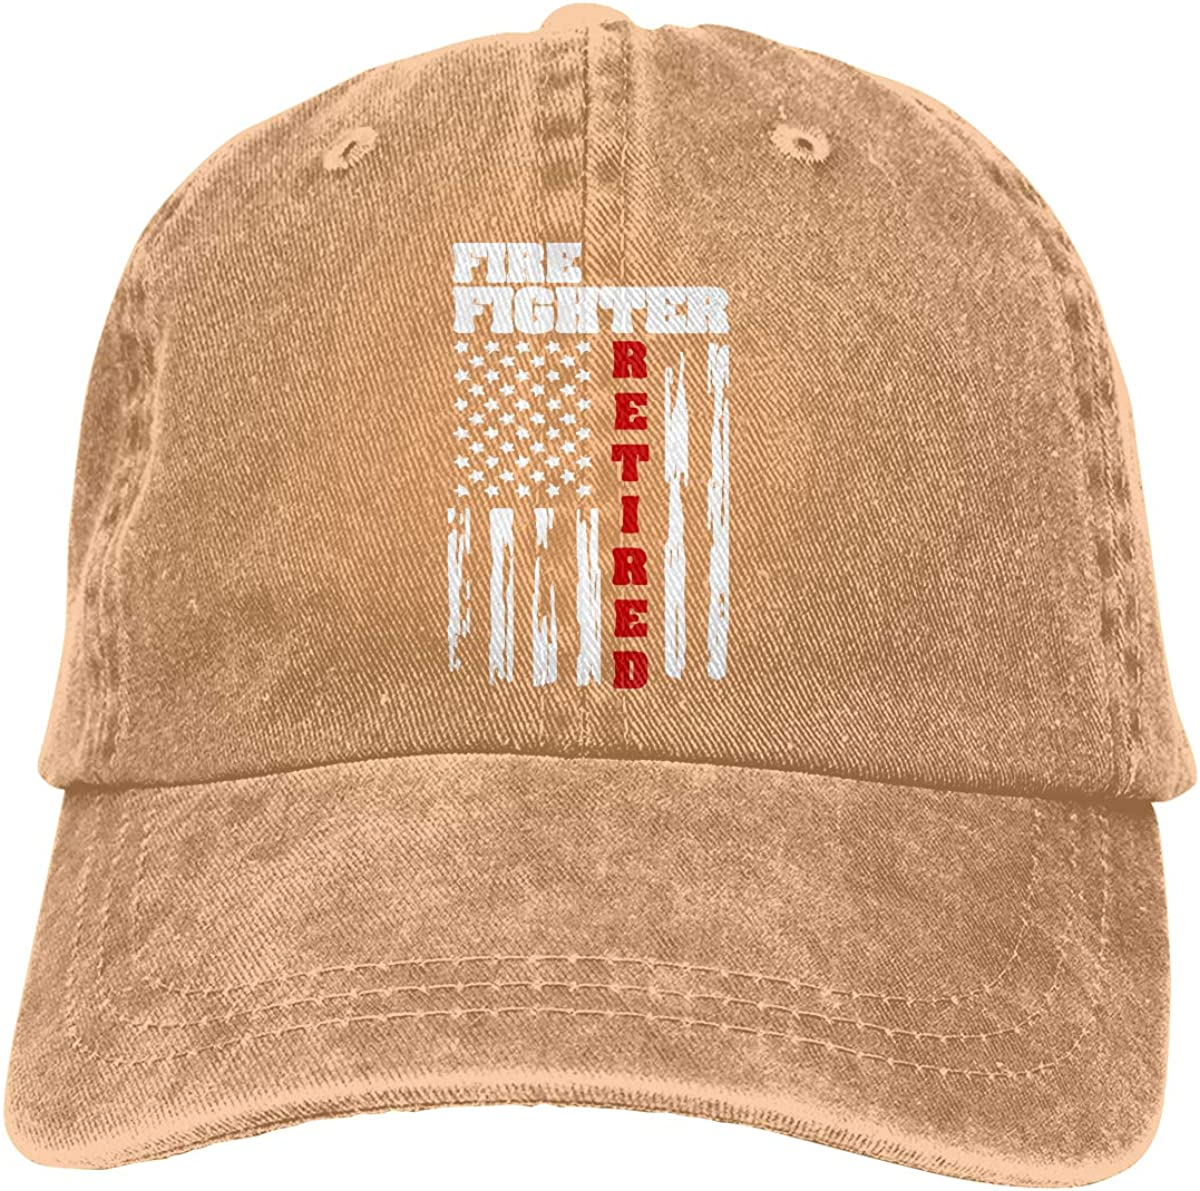 Distressed American Flag Unisex Trendy Denim Hip Hop Cap Adjustable Baseball Cap PMGM-C Fire Fighter Retired